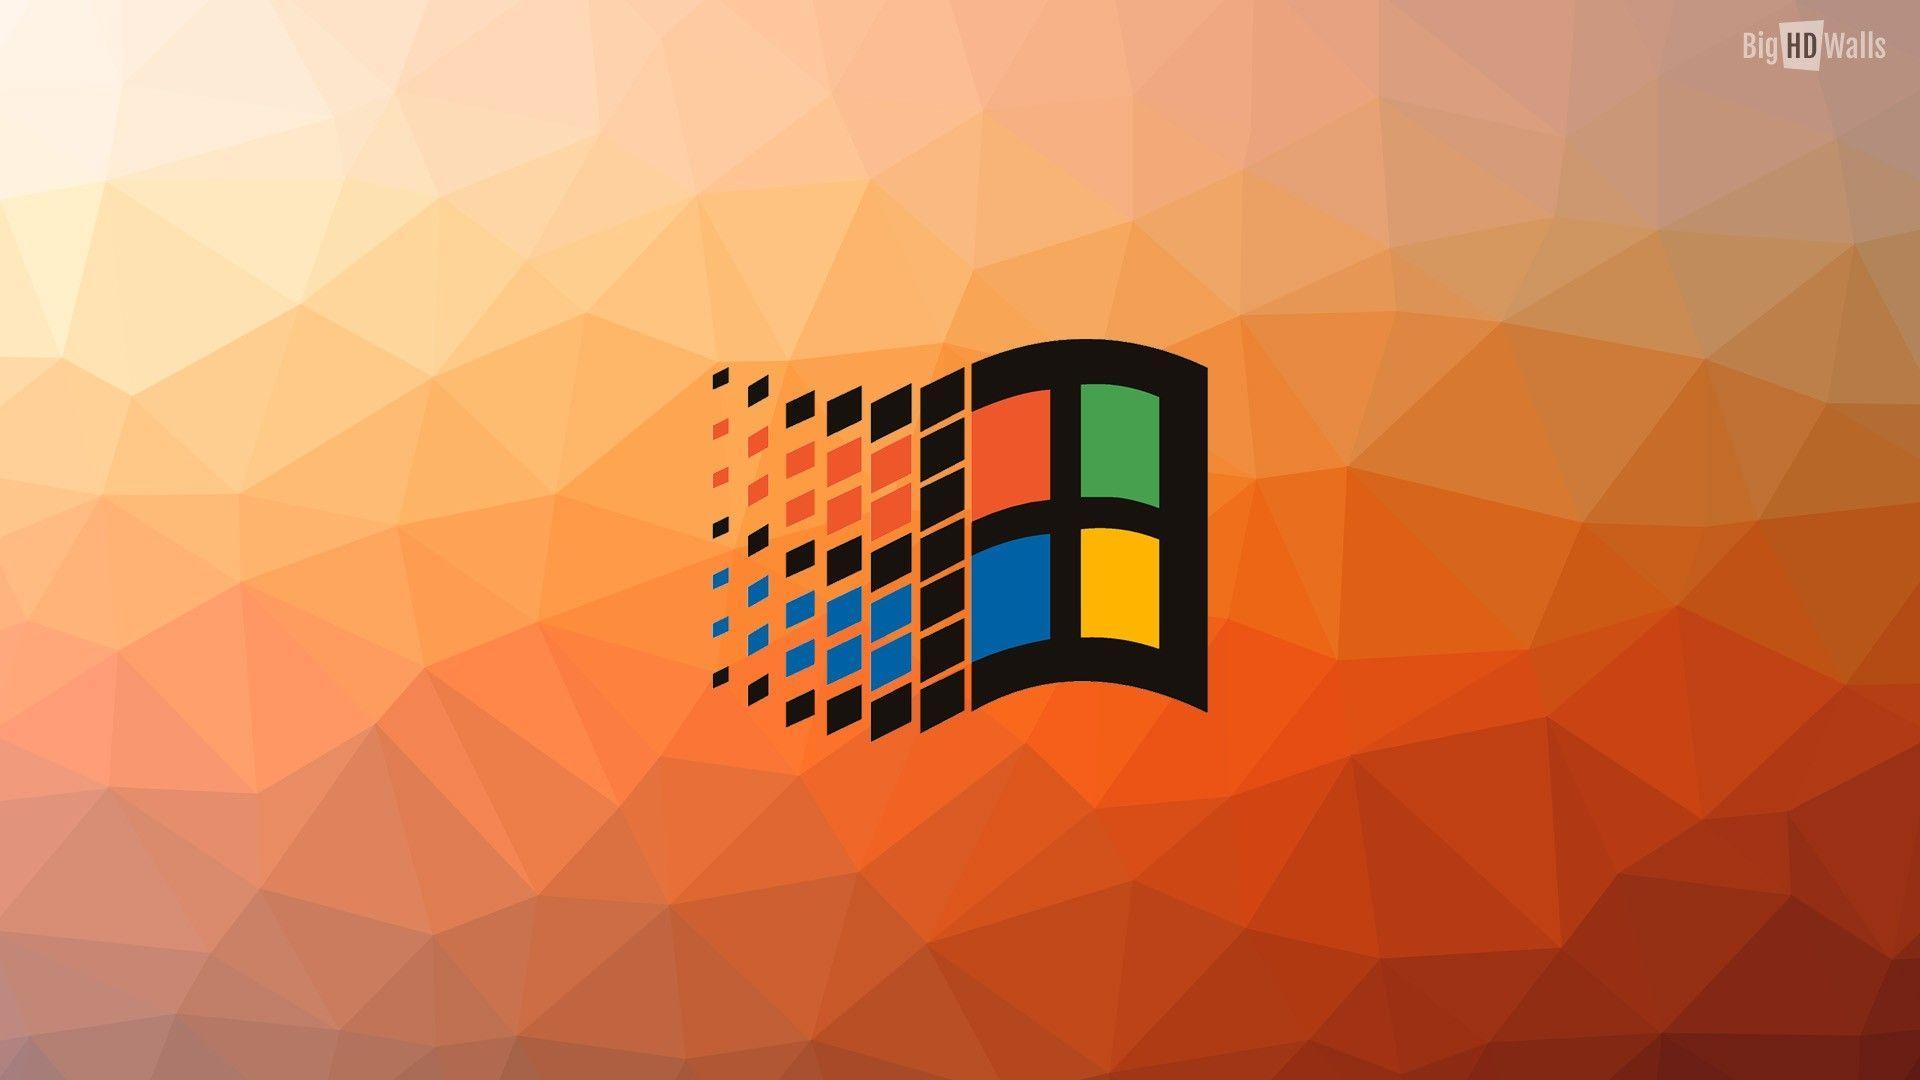 Windows 98 Backgrounds - Wallpaper Cave